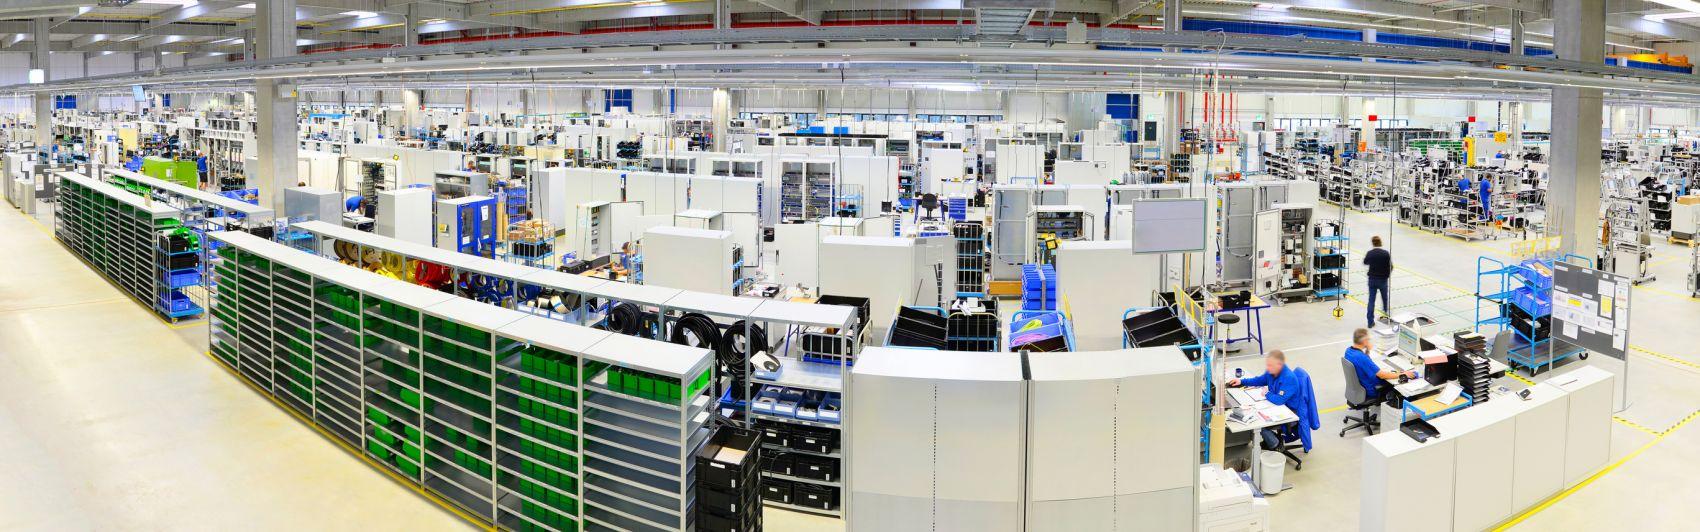 Industrie-Produktionshalle